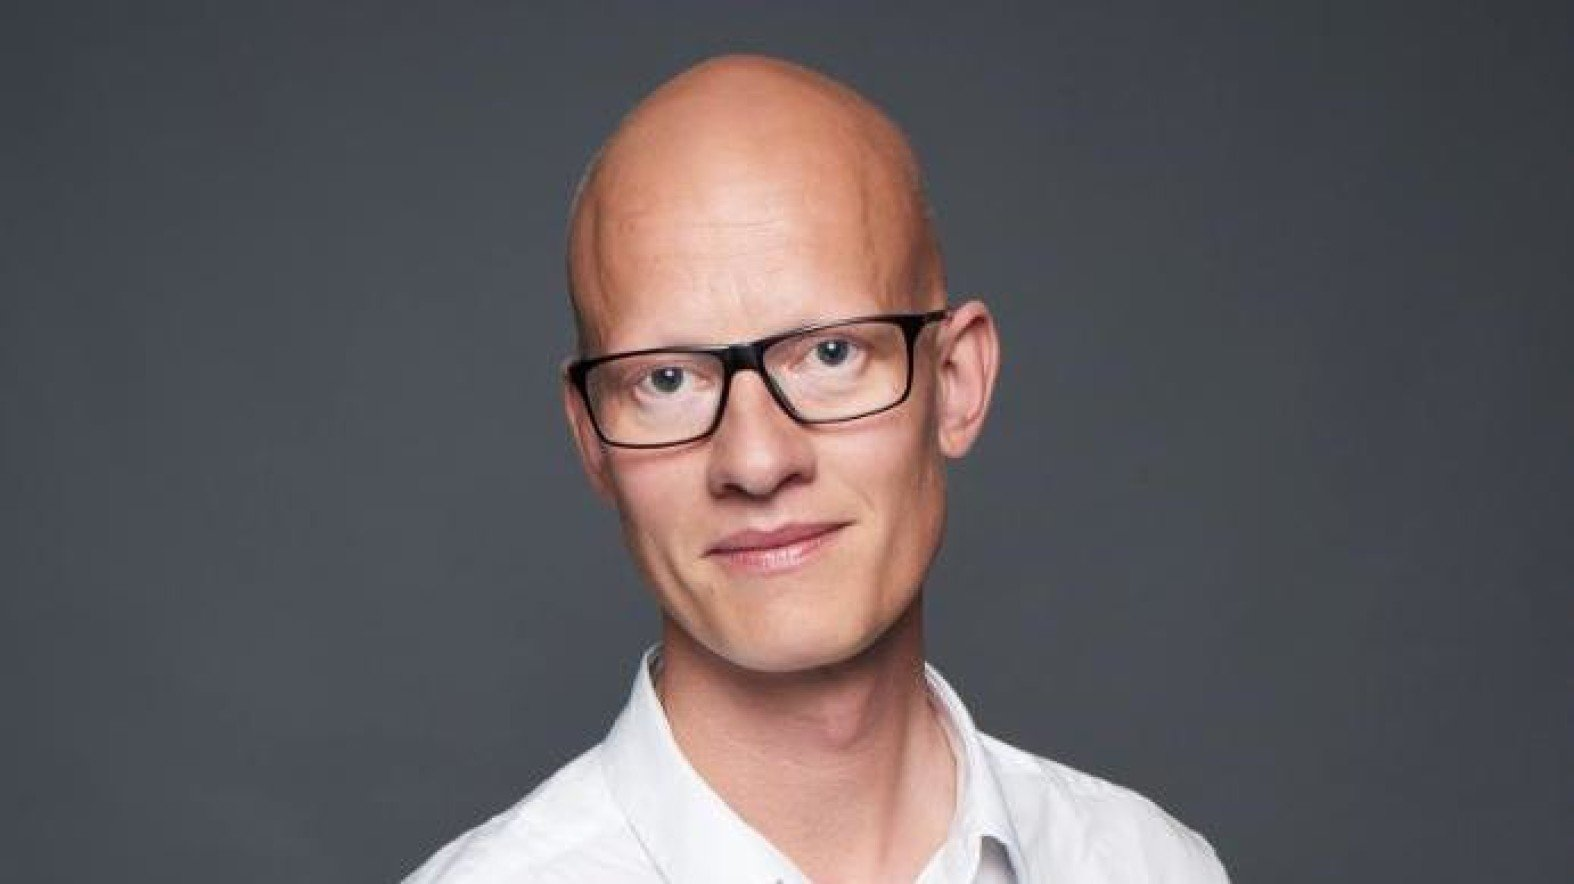 DR's dramachef Christian Rank